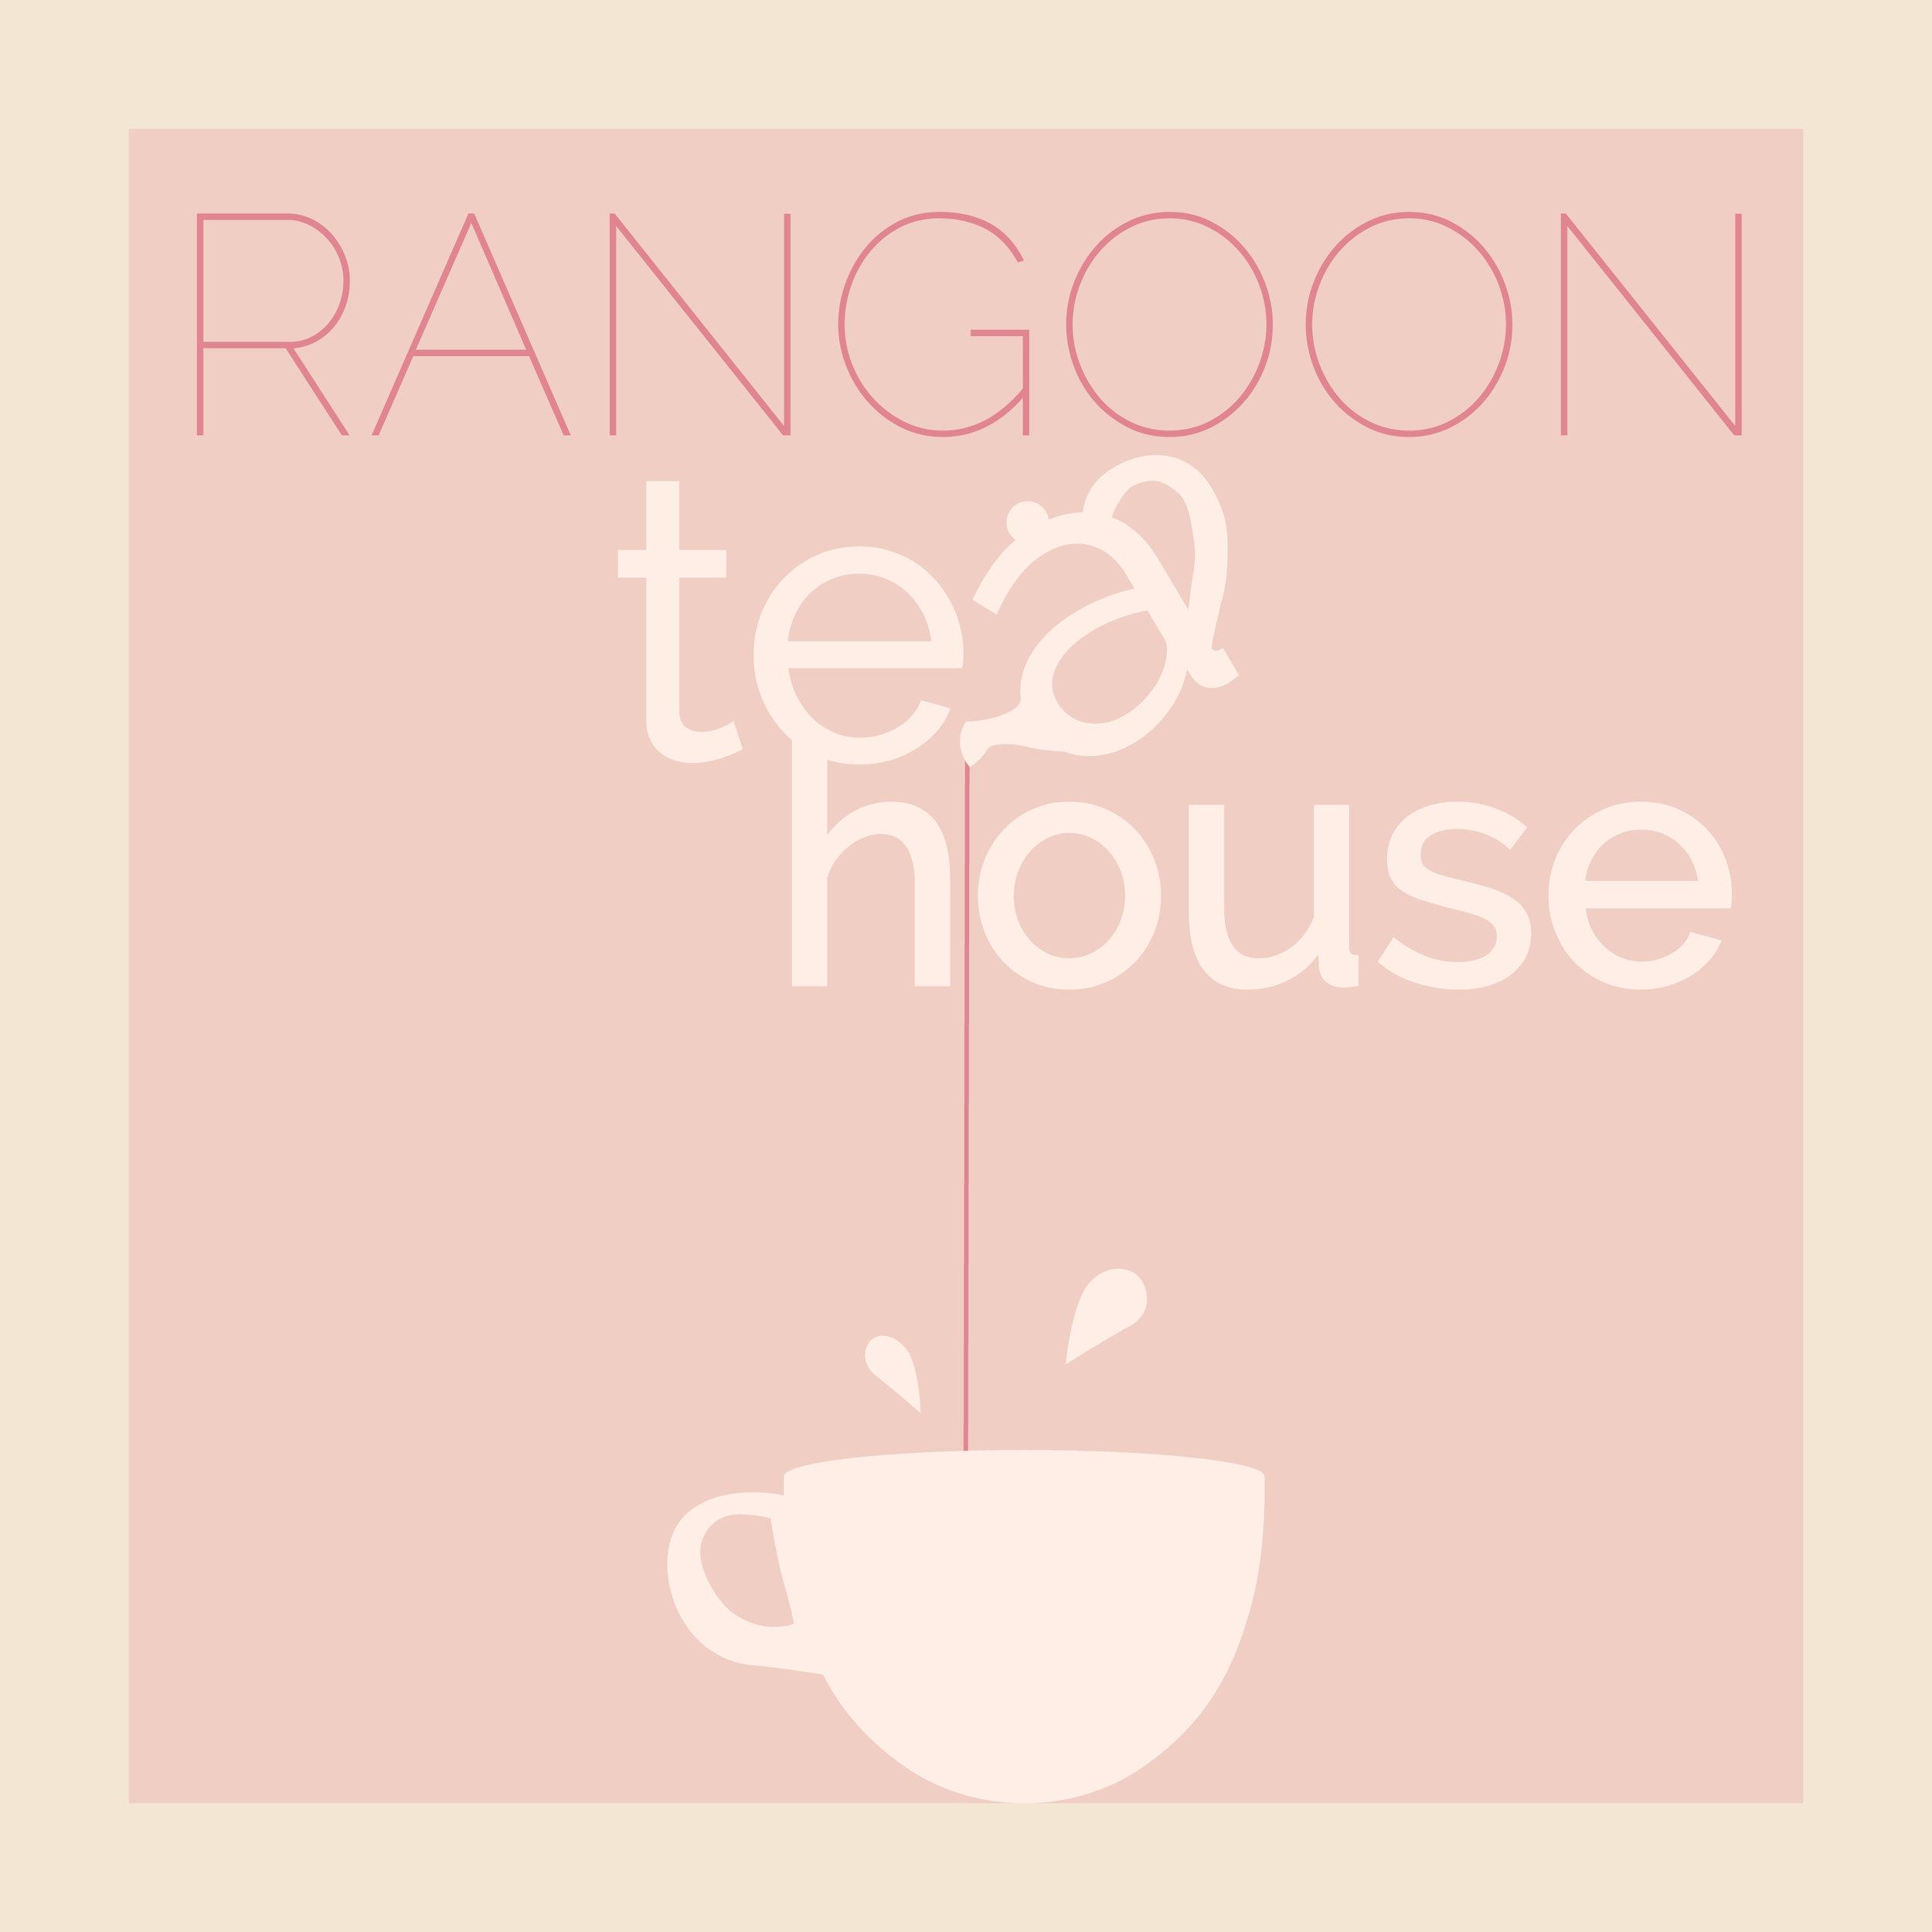 19 Rangoon Tea House.jpg